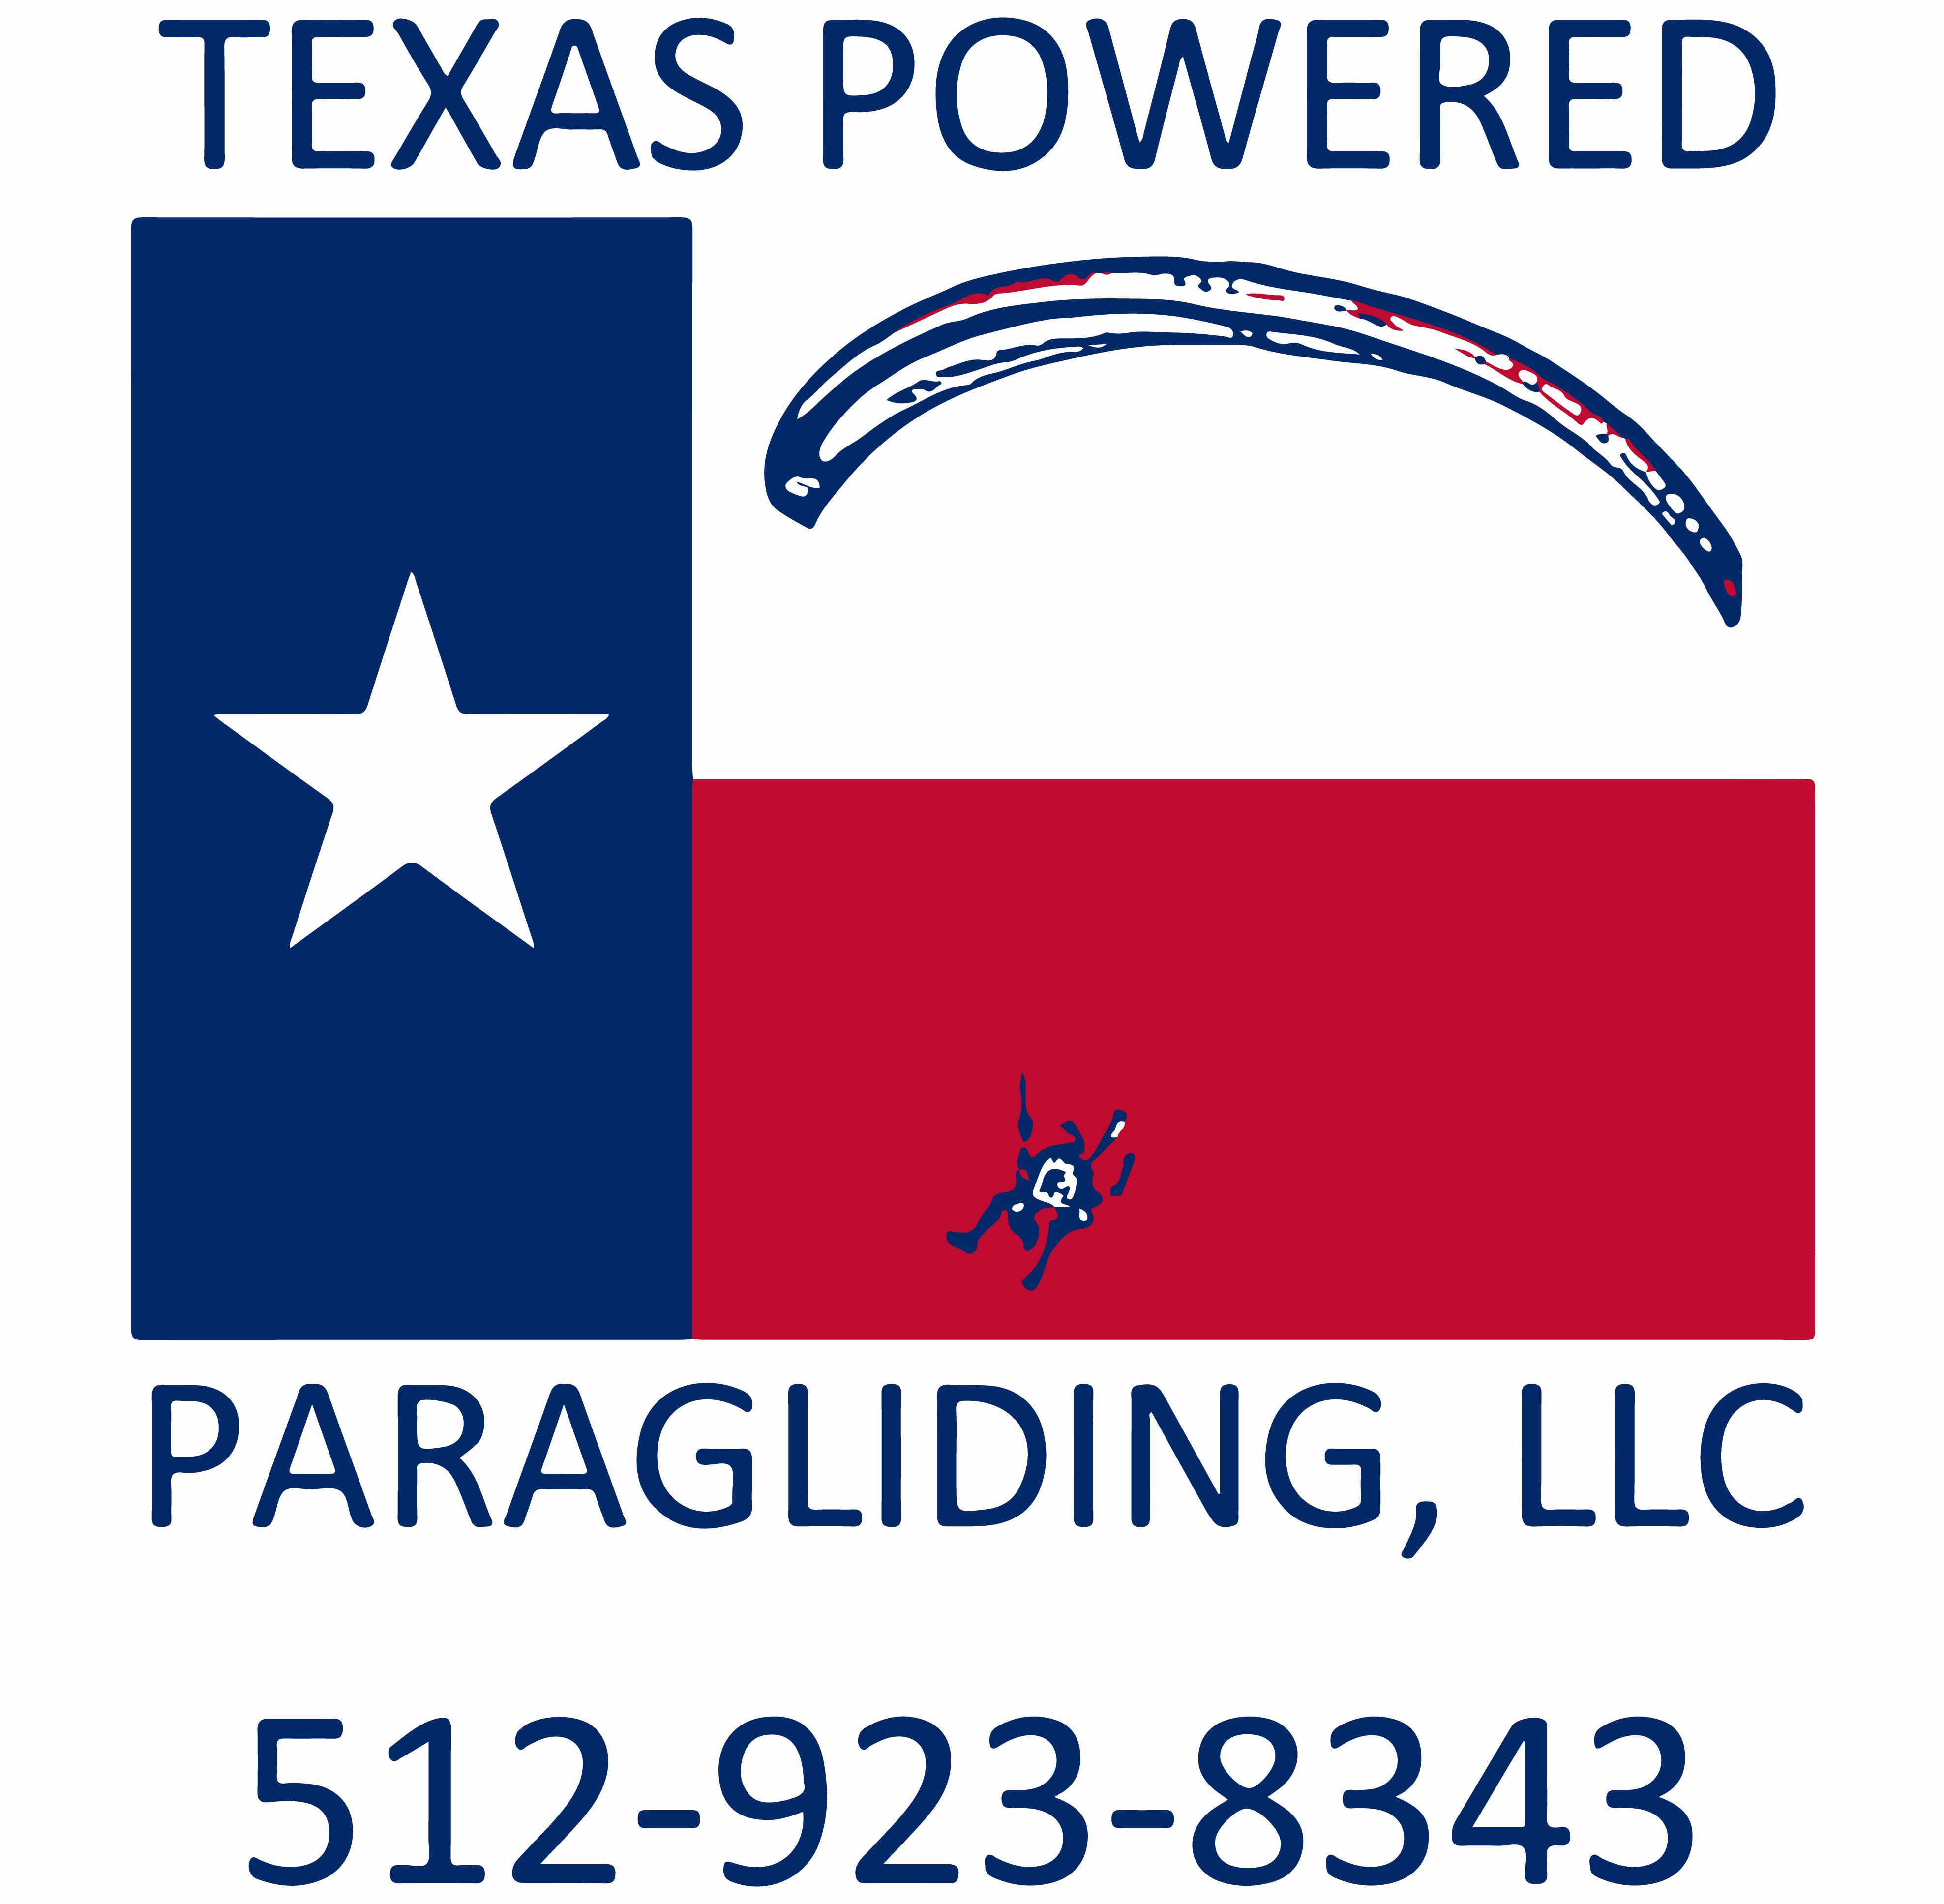 Texas Powered Paragliding, LLC – Step Into The Sky! 512-923-8343